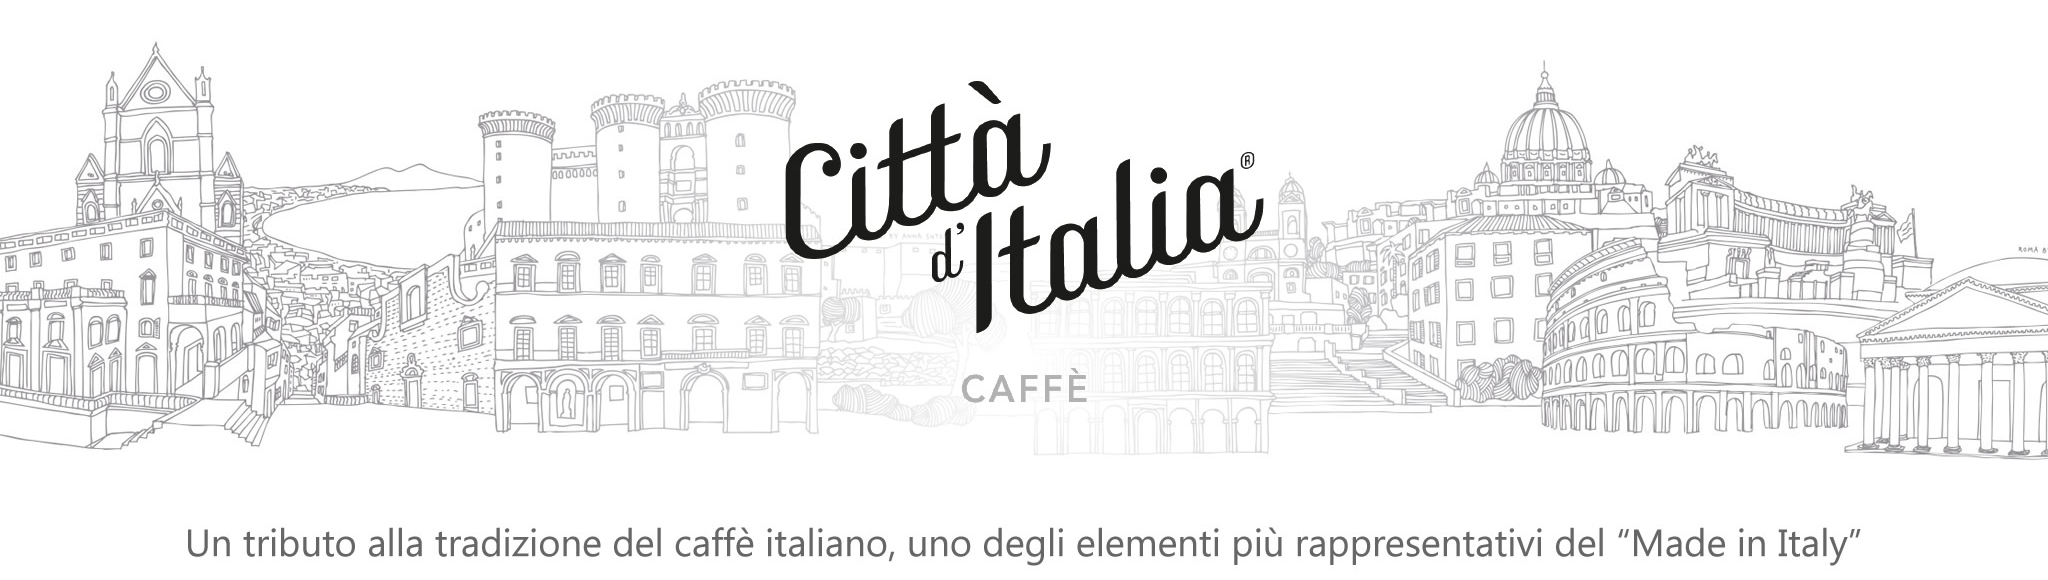 banner-citta-italia